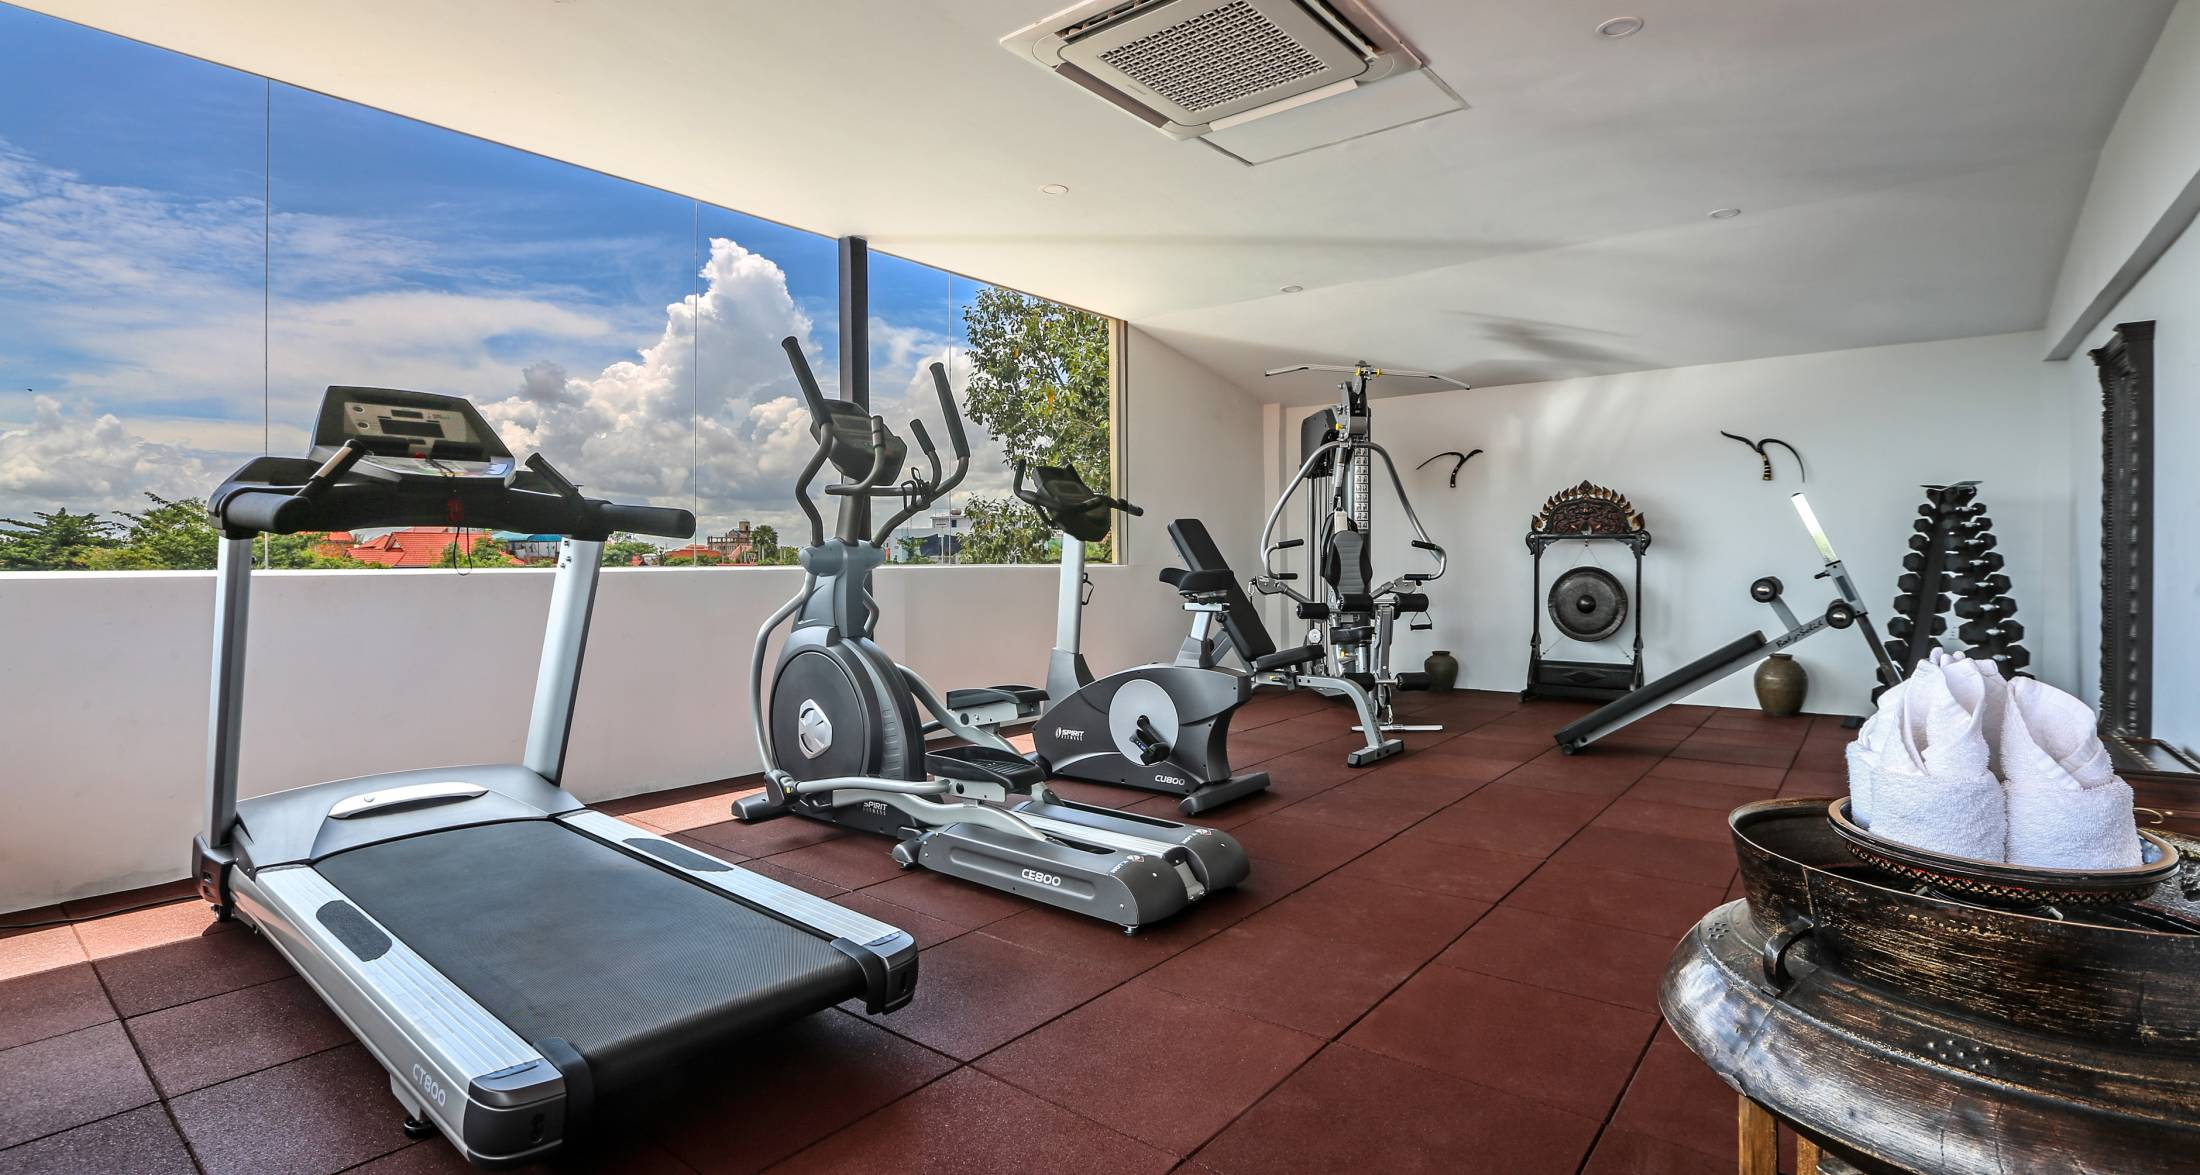 Wellness and spa centre sunset gym room siem reap near angkor